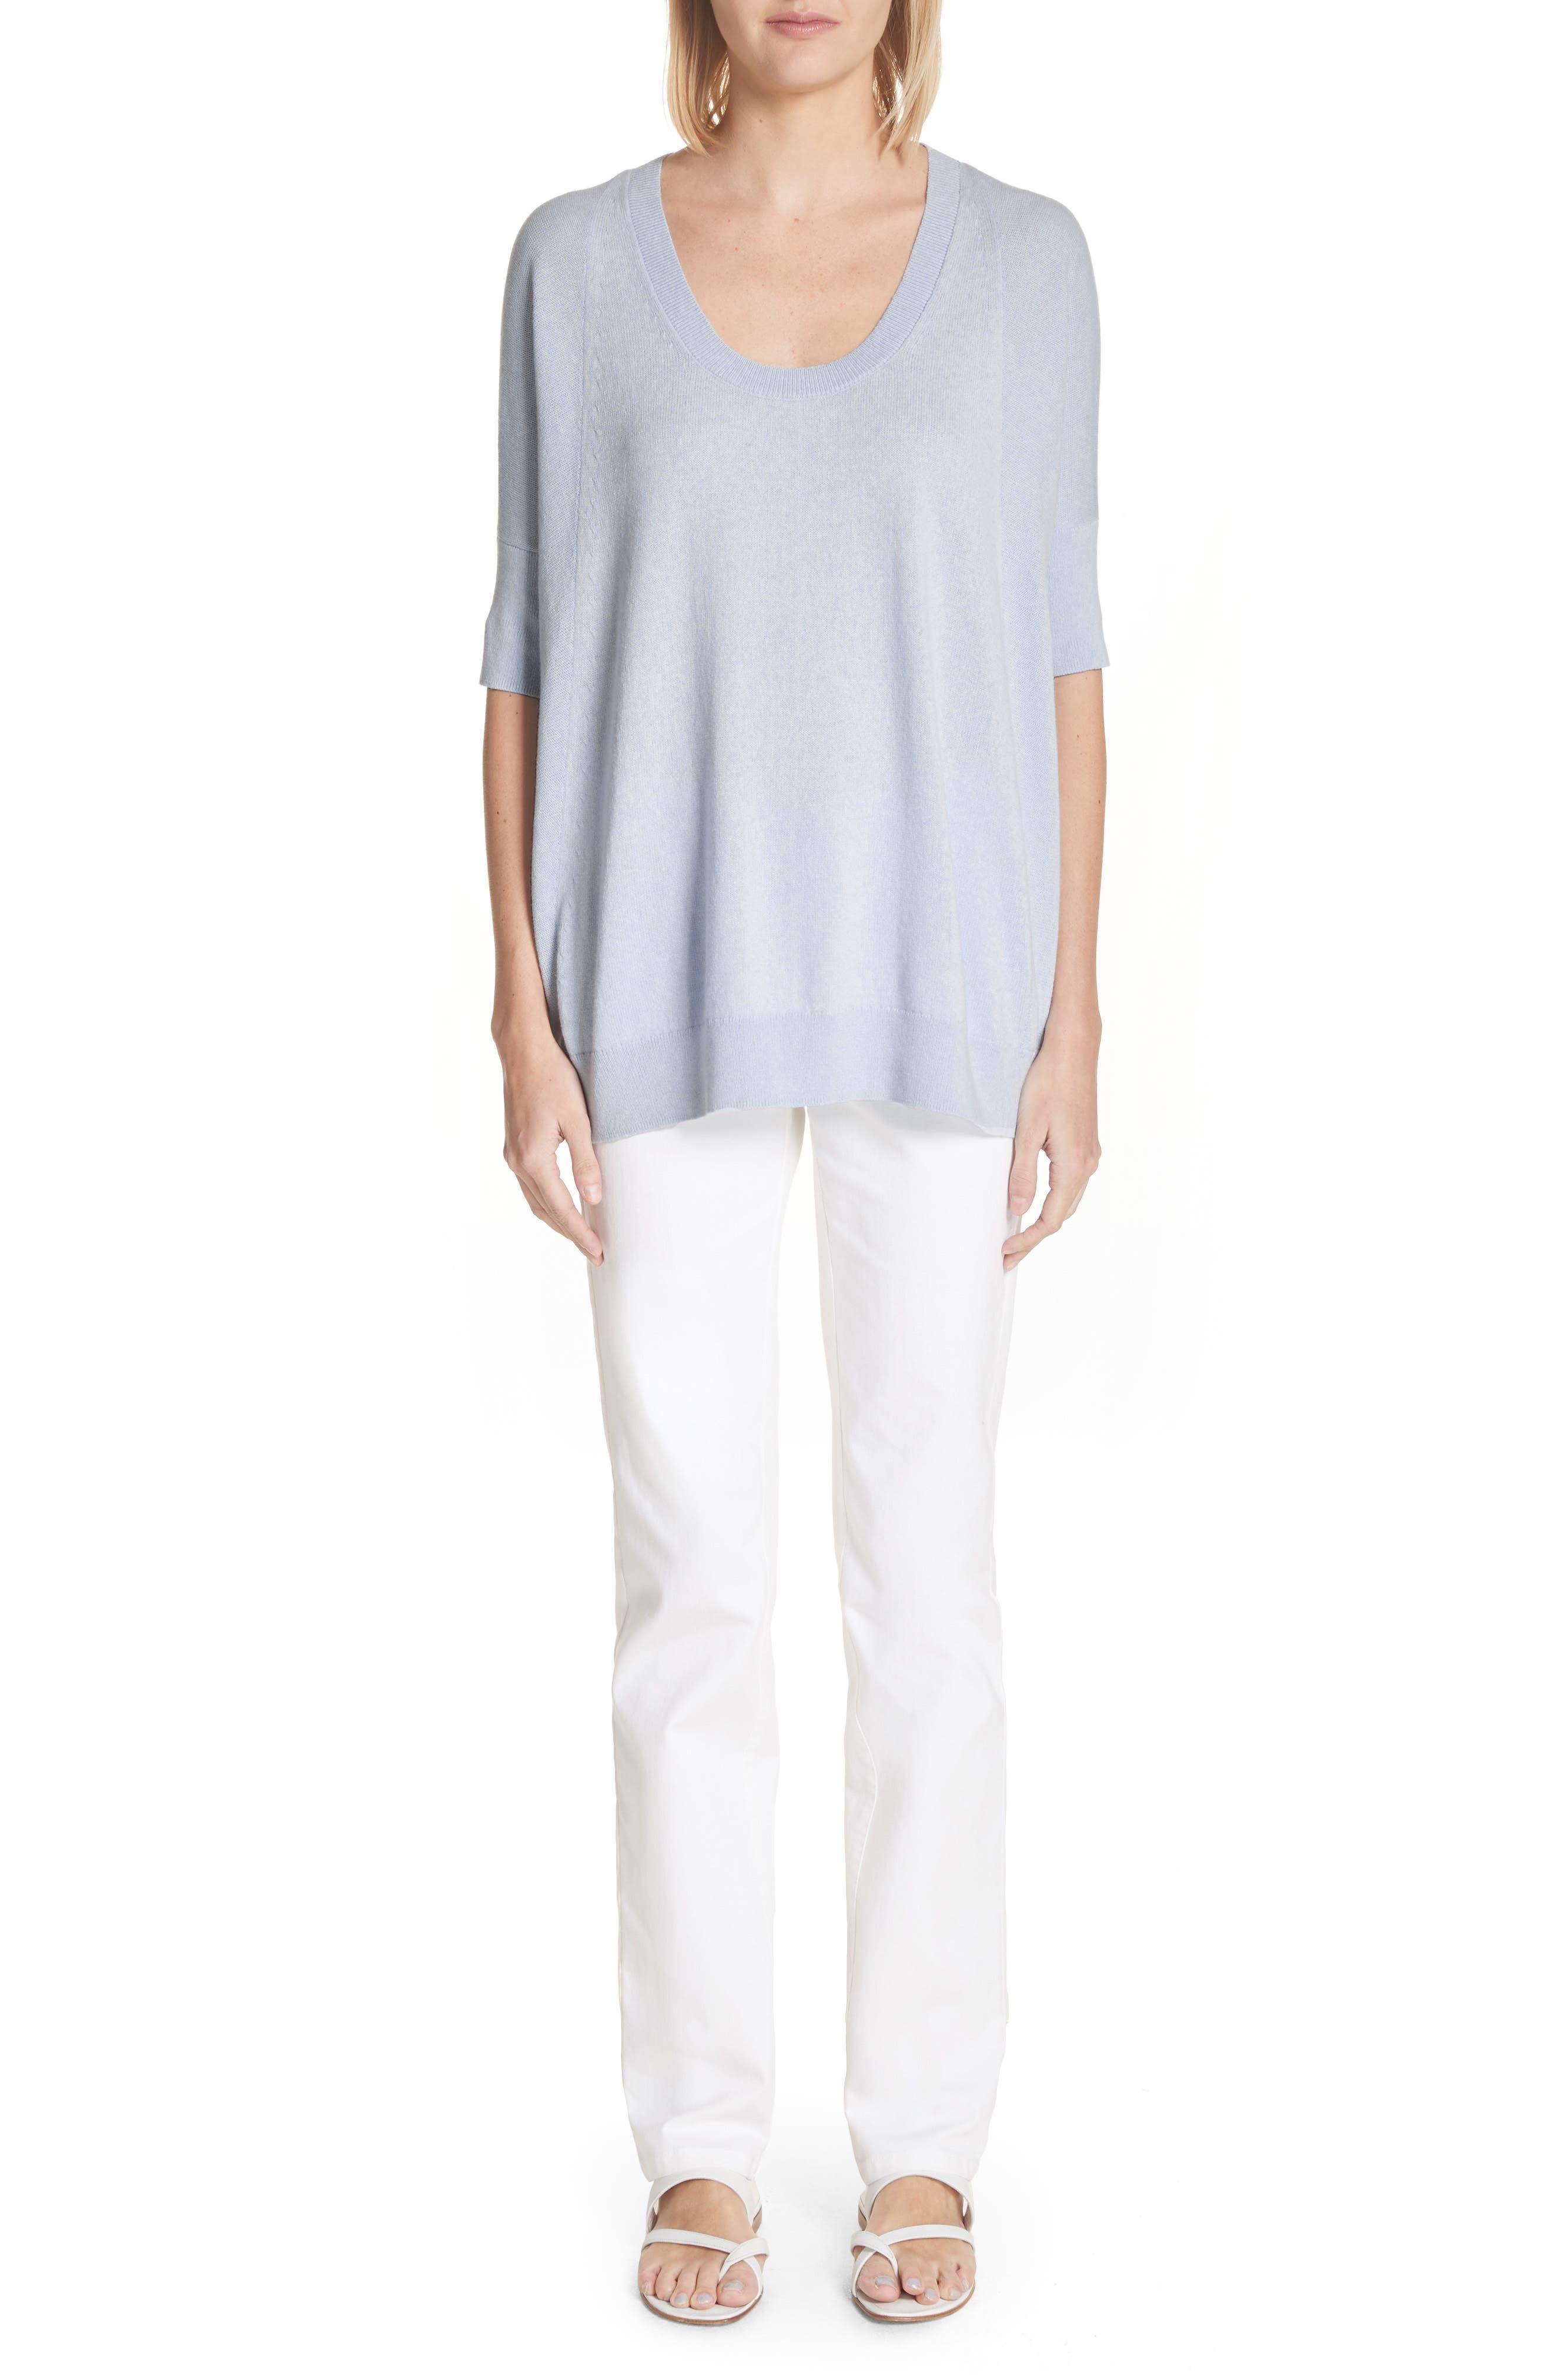 Cotton, Cashmere & Silk Oversized Scoop Neck Sweater,                             Alternate thumbnail 7, color,                             Pale Blue Melange